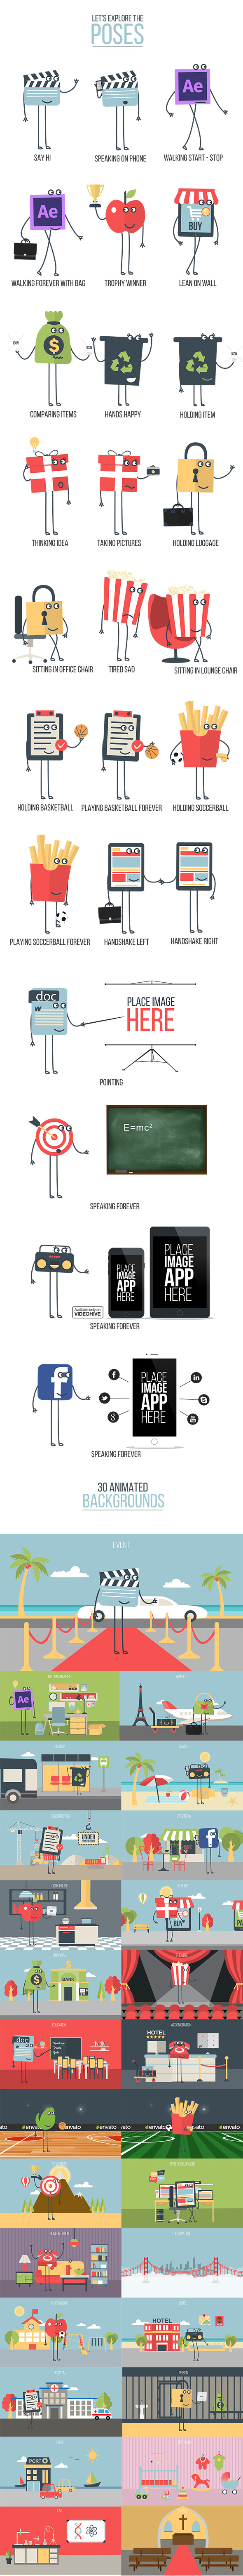 Cartoon Explainer Toolkit - 9